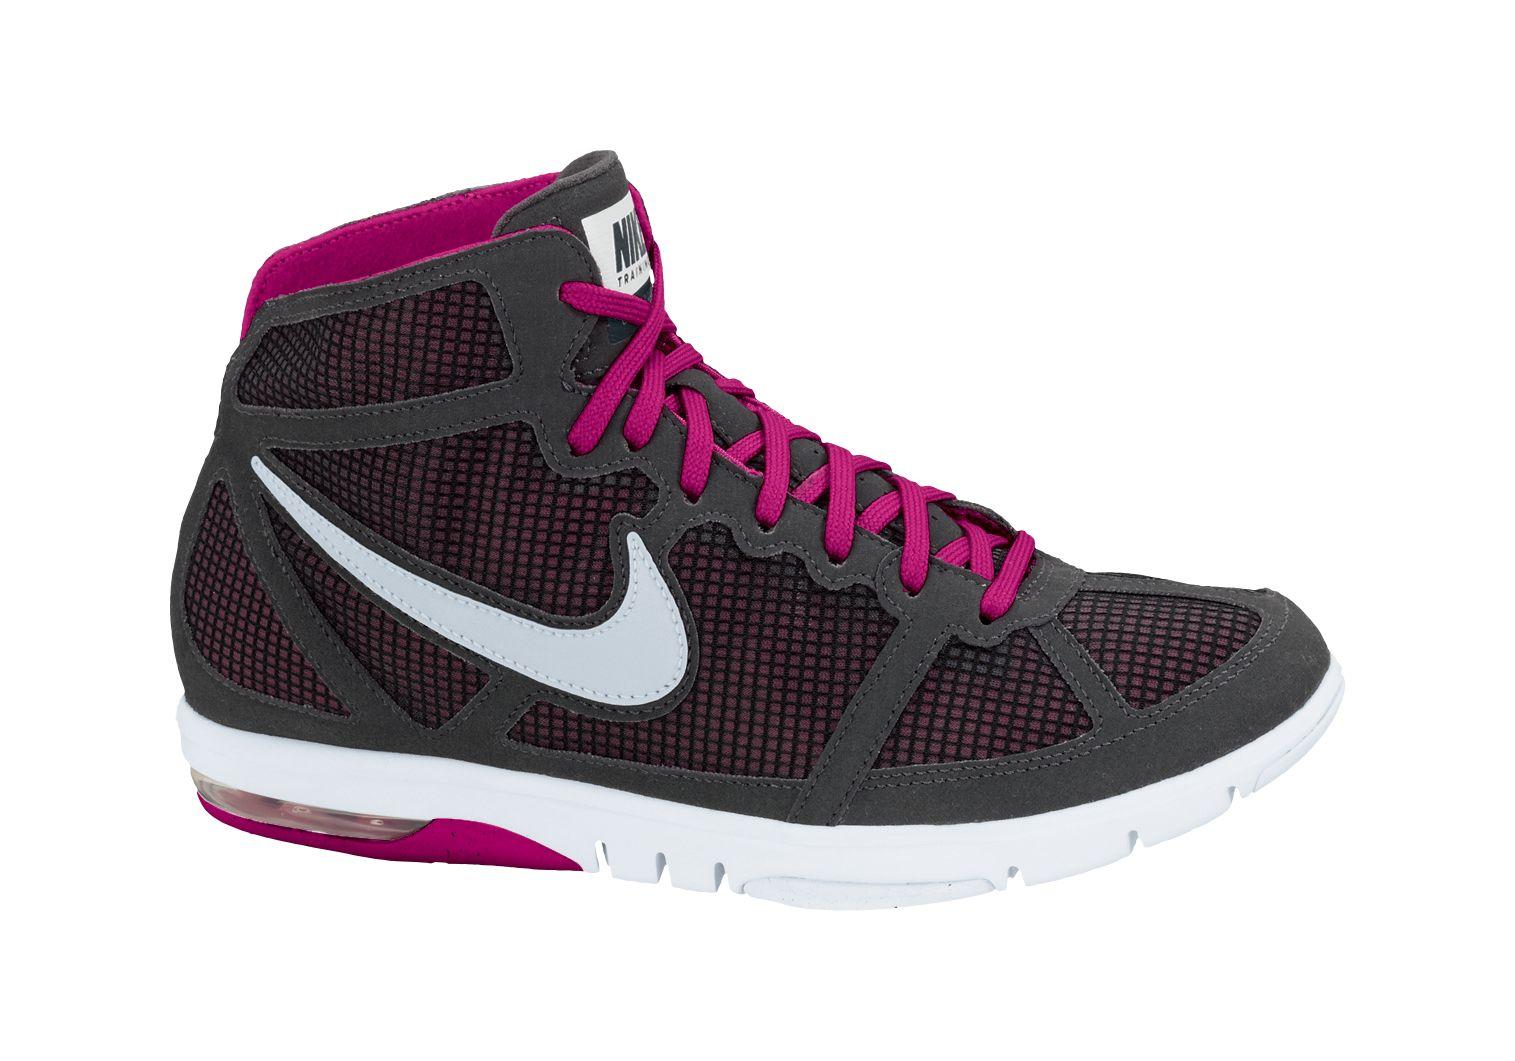 Nike Lady Air Max S2S mid in Schwarz Weiß